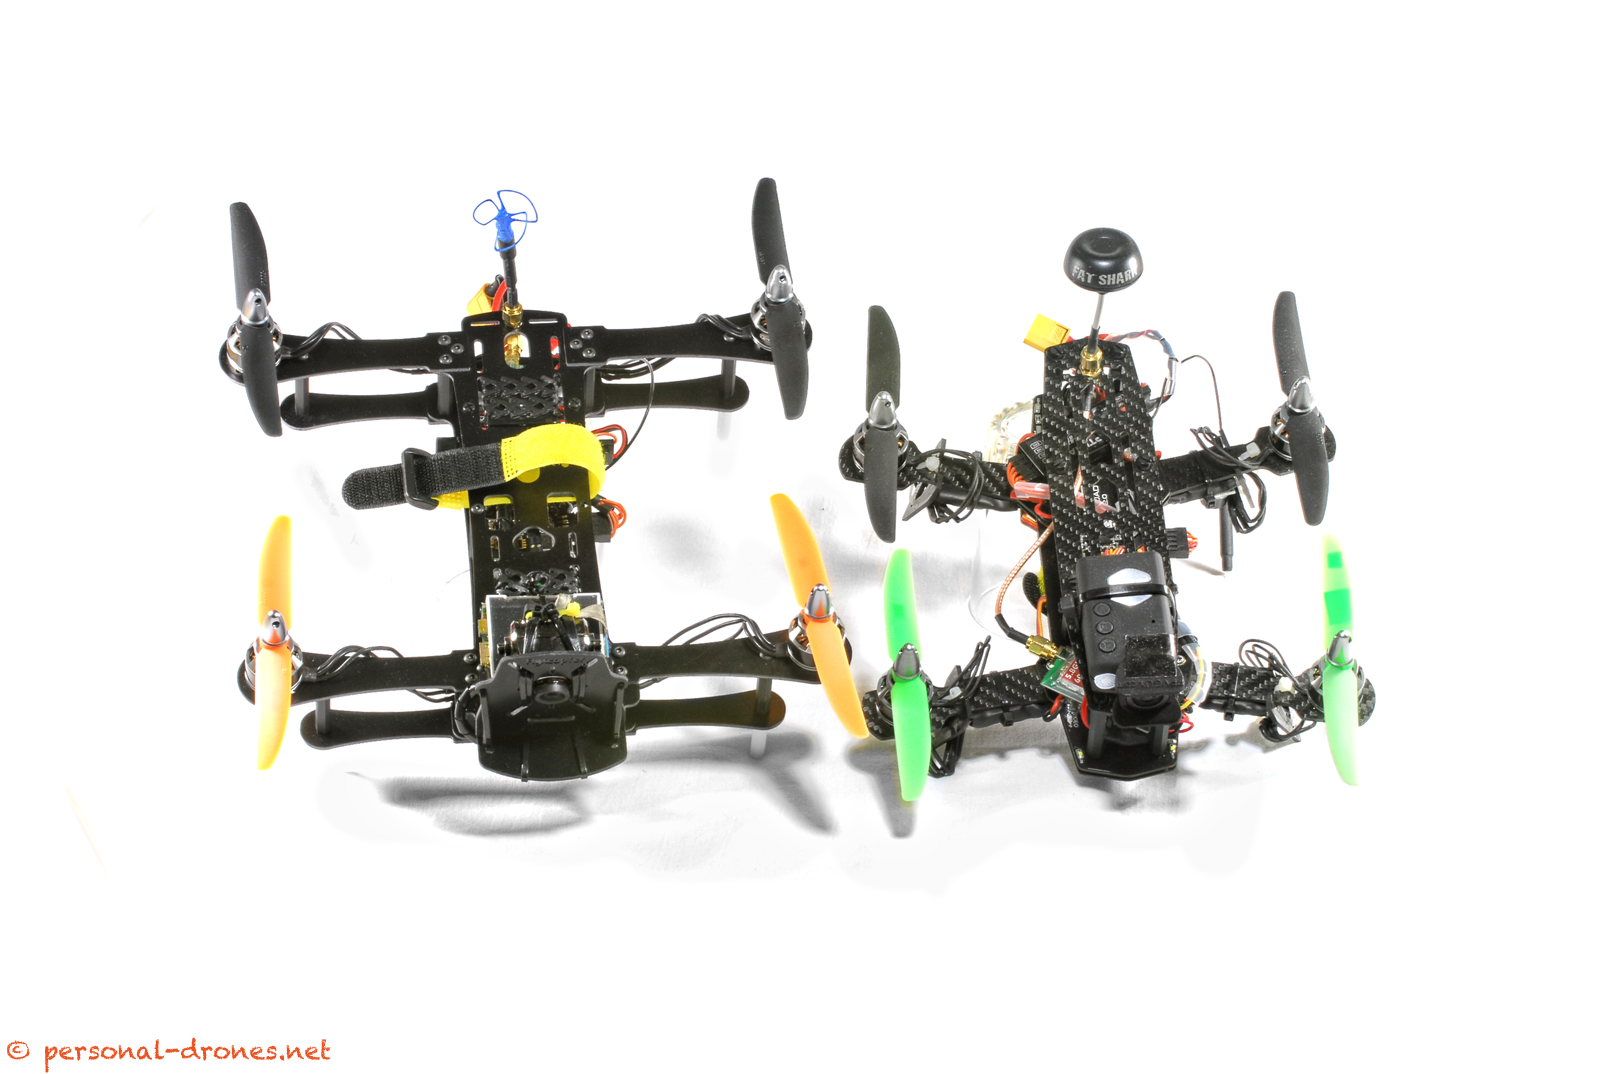 FlyXcopter FlyX-Mini vs Blackout Mini H Quad